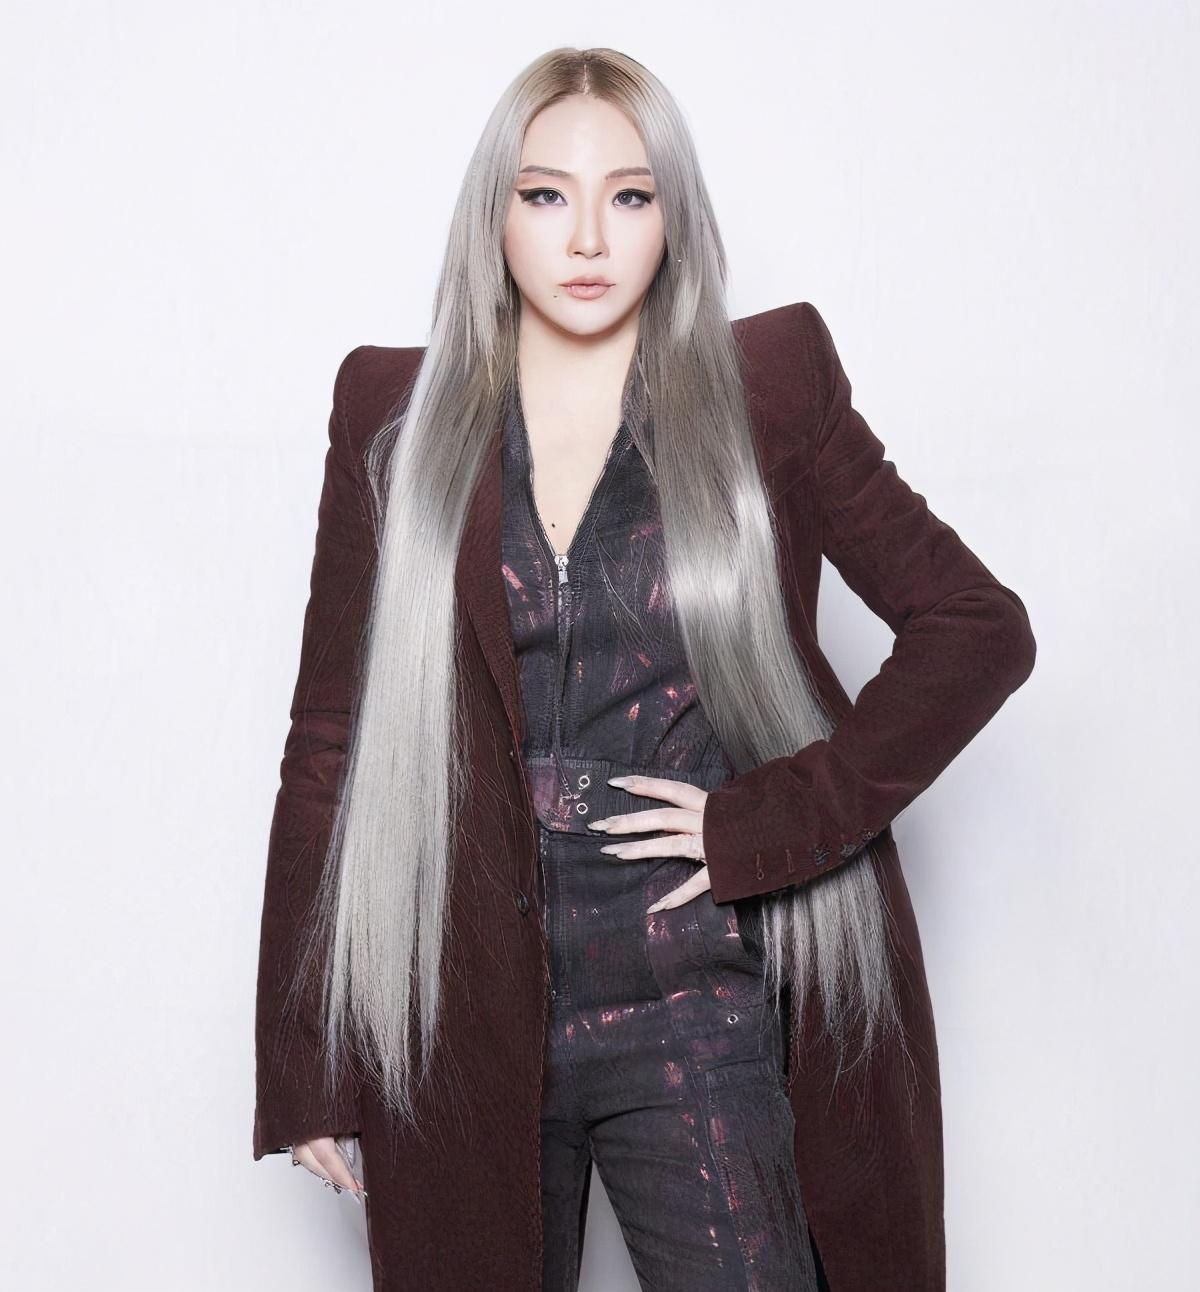 CL親自下場磕CP,被指蹭權志龍熱度,網友:換火的女愛豆試試